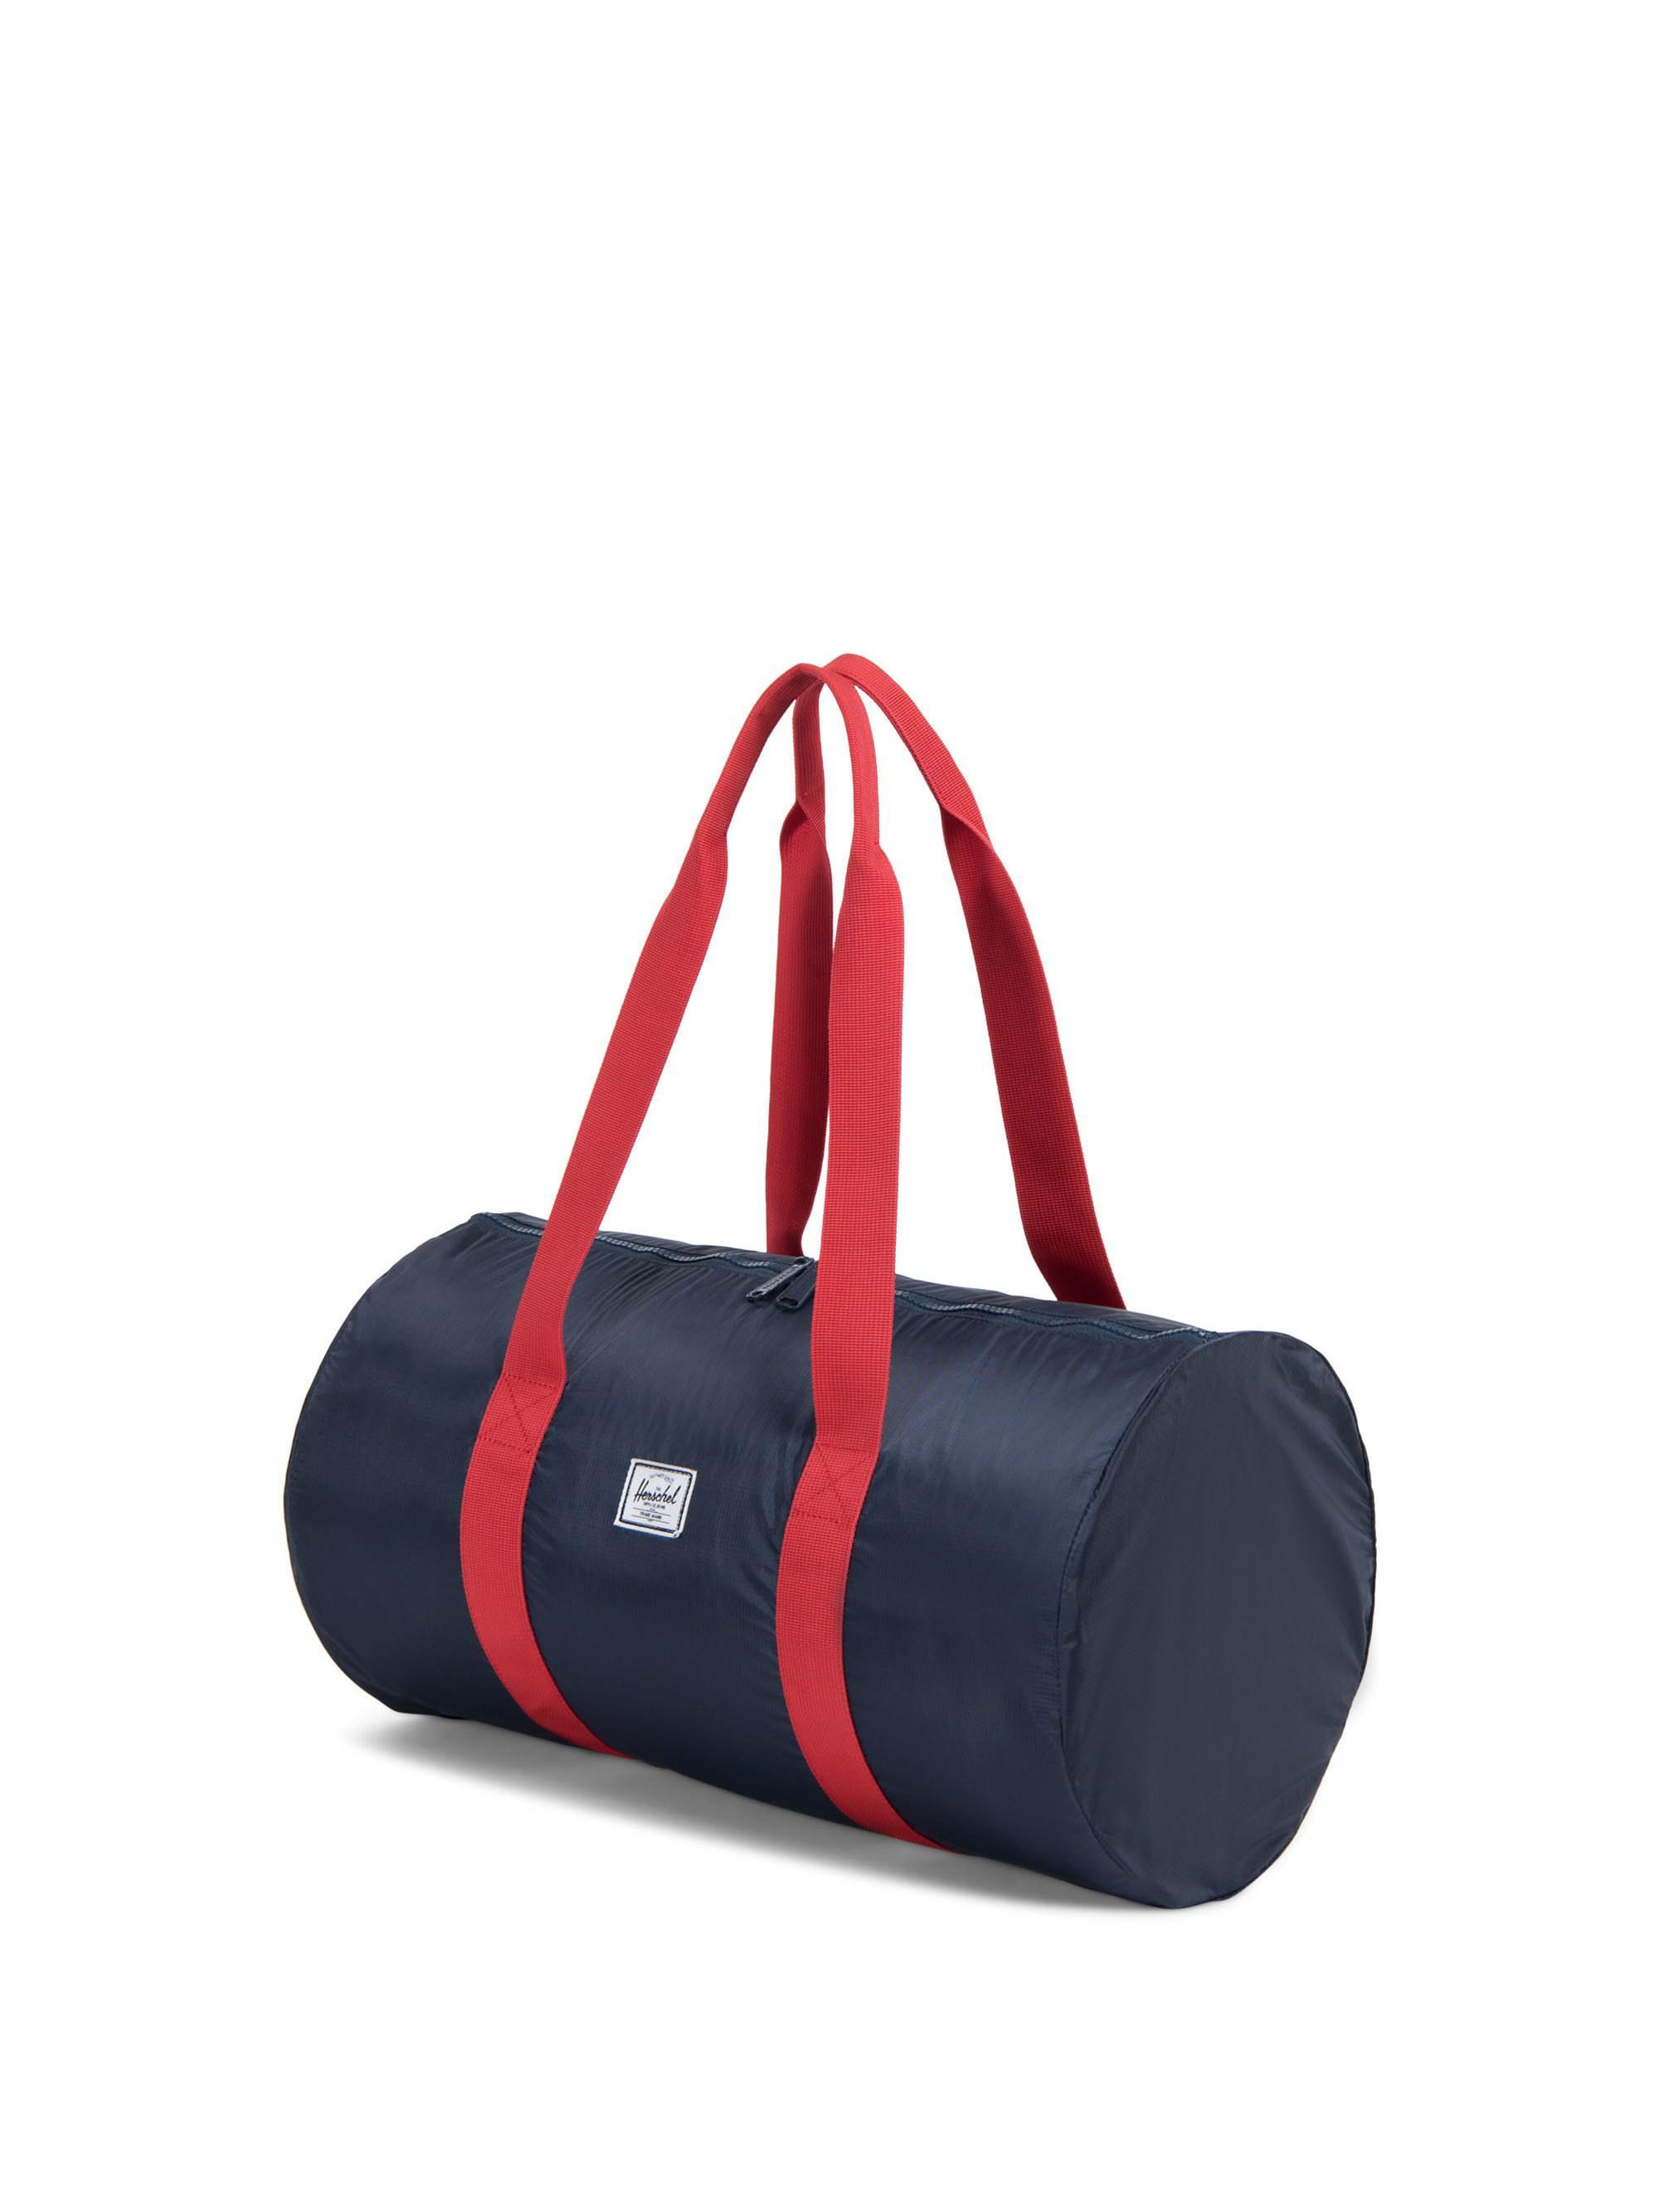 75fff7fa6f3e Herschel Supply Co. Packables Packable Duffel Bag in Red for Men - Lyst